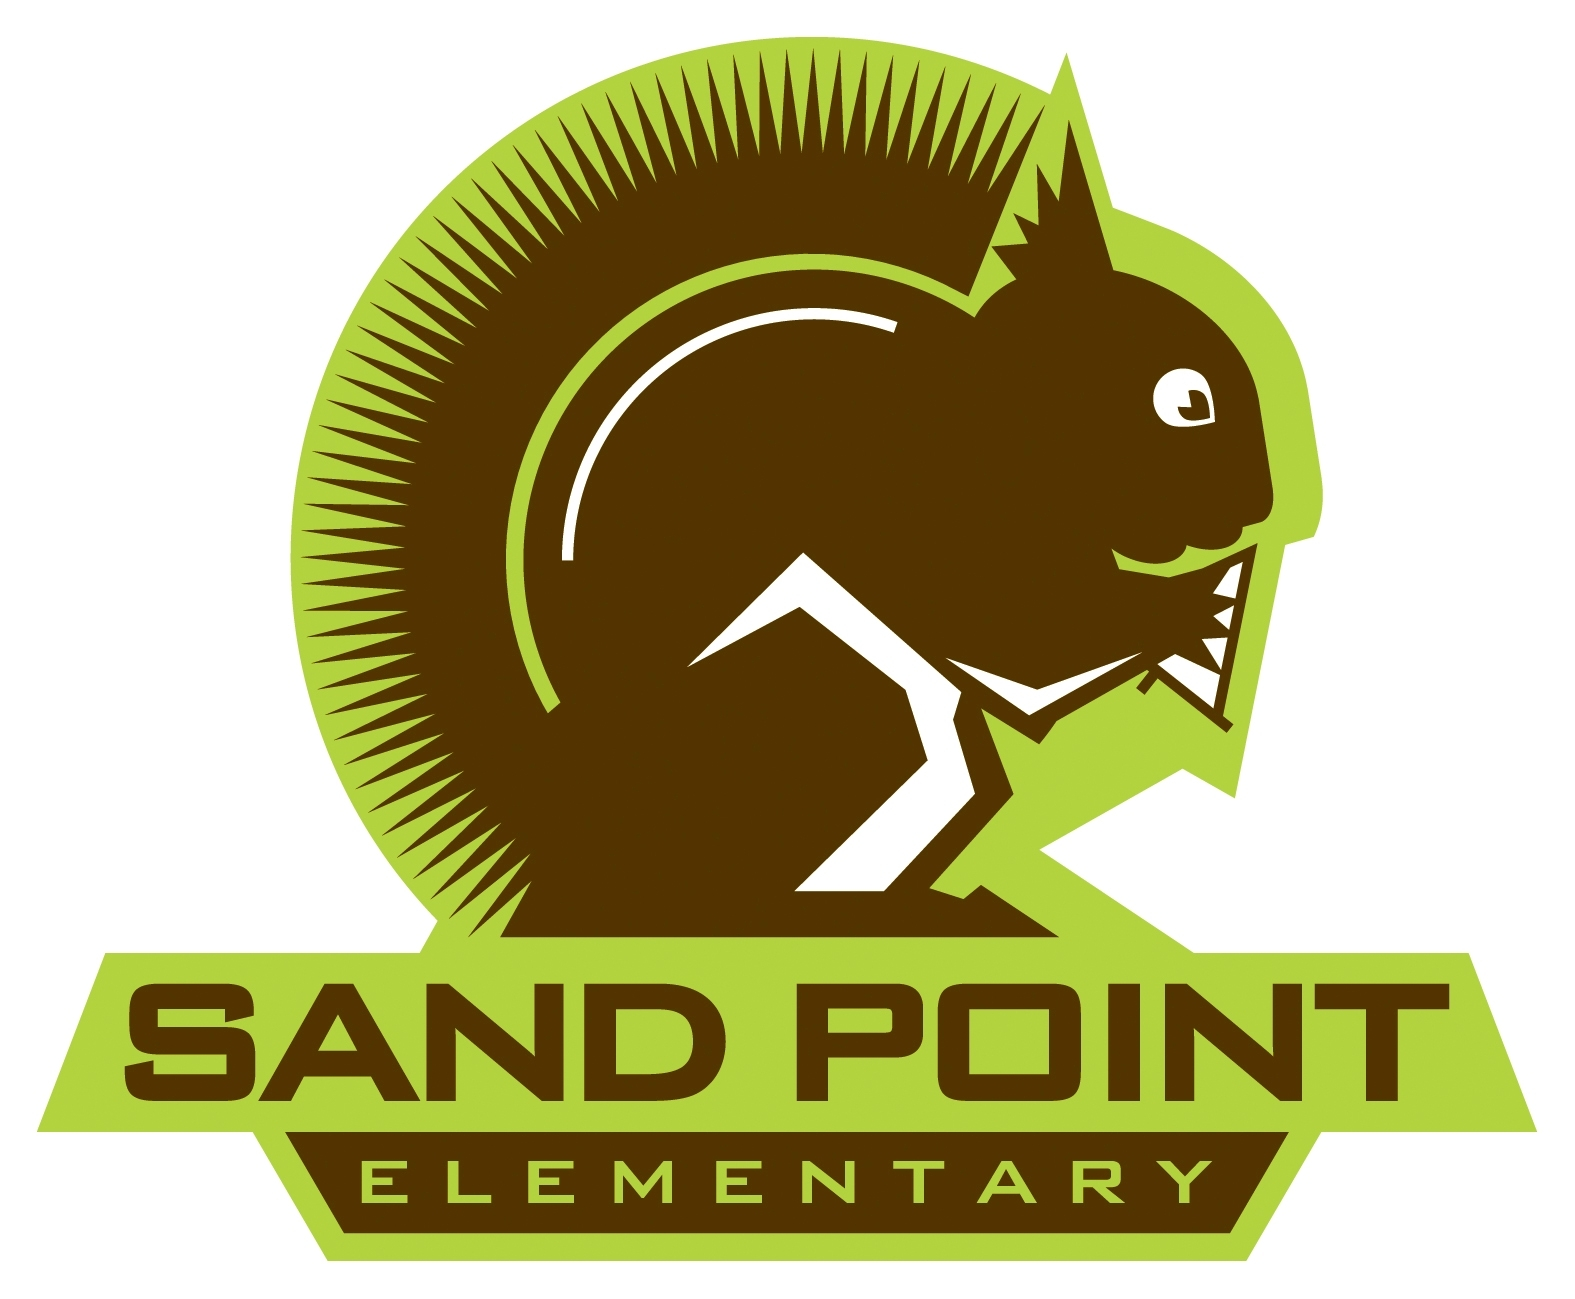 Sand Point Elementary logo